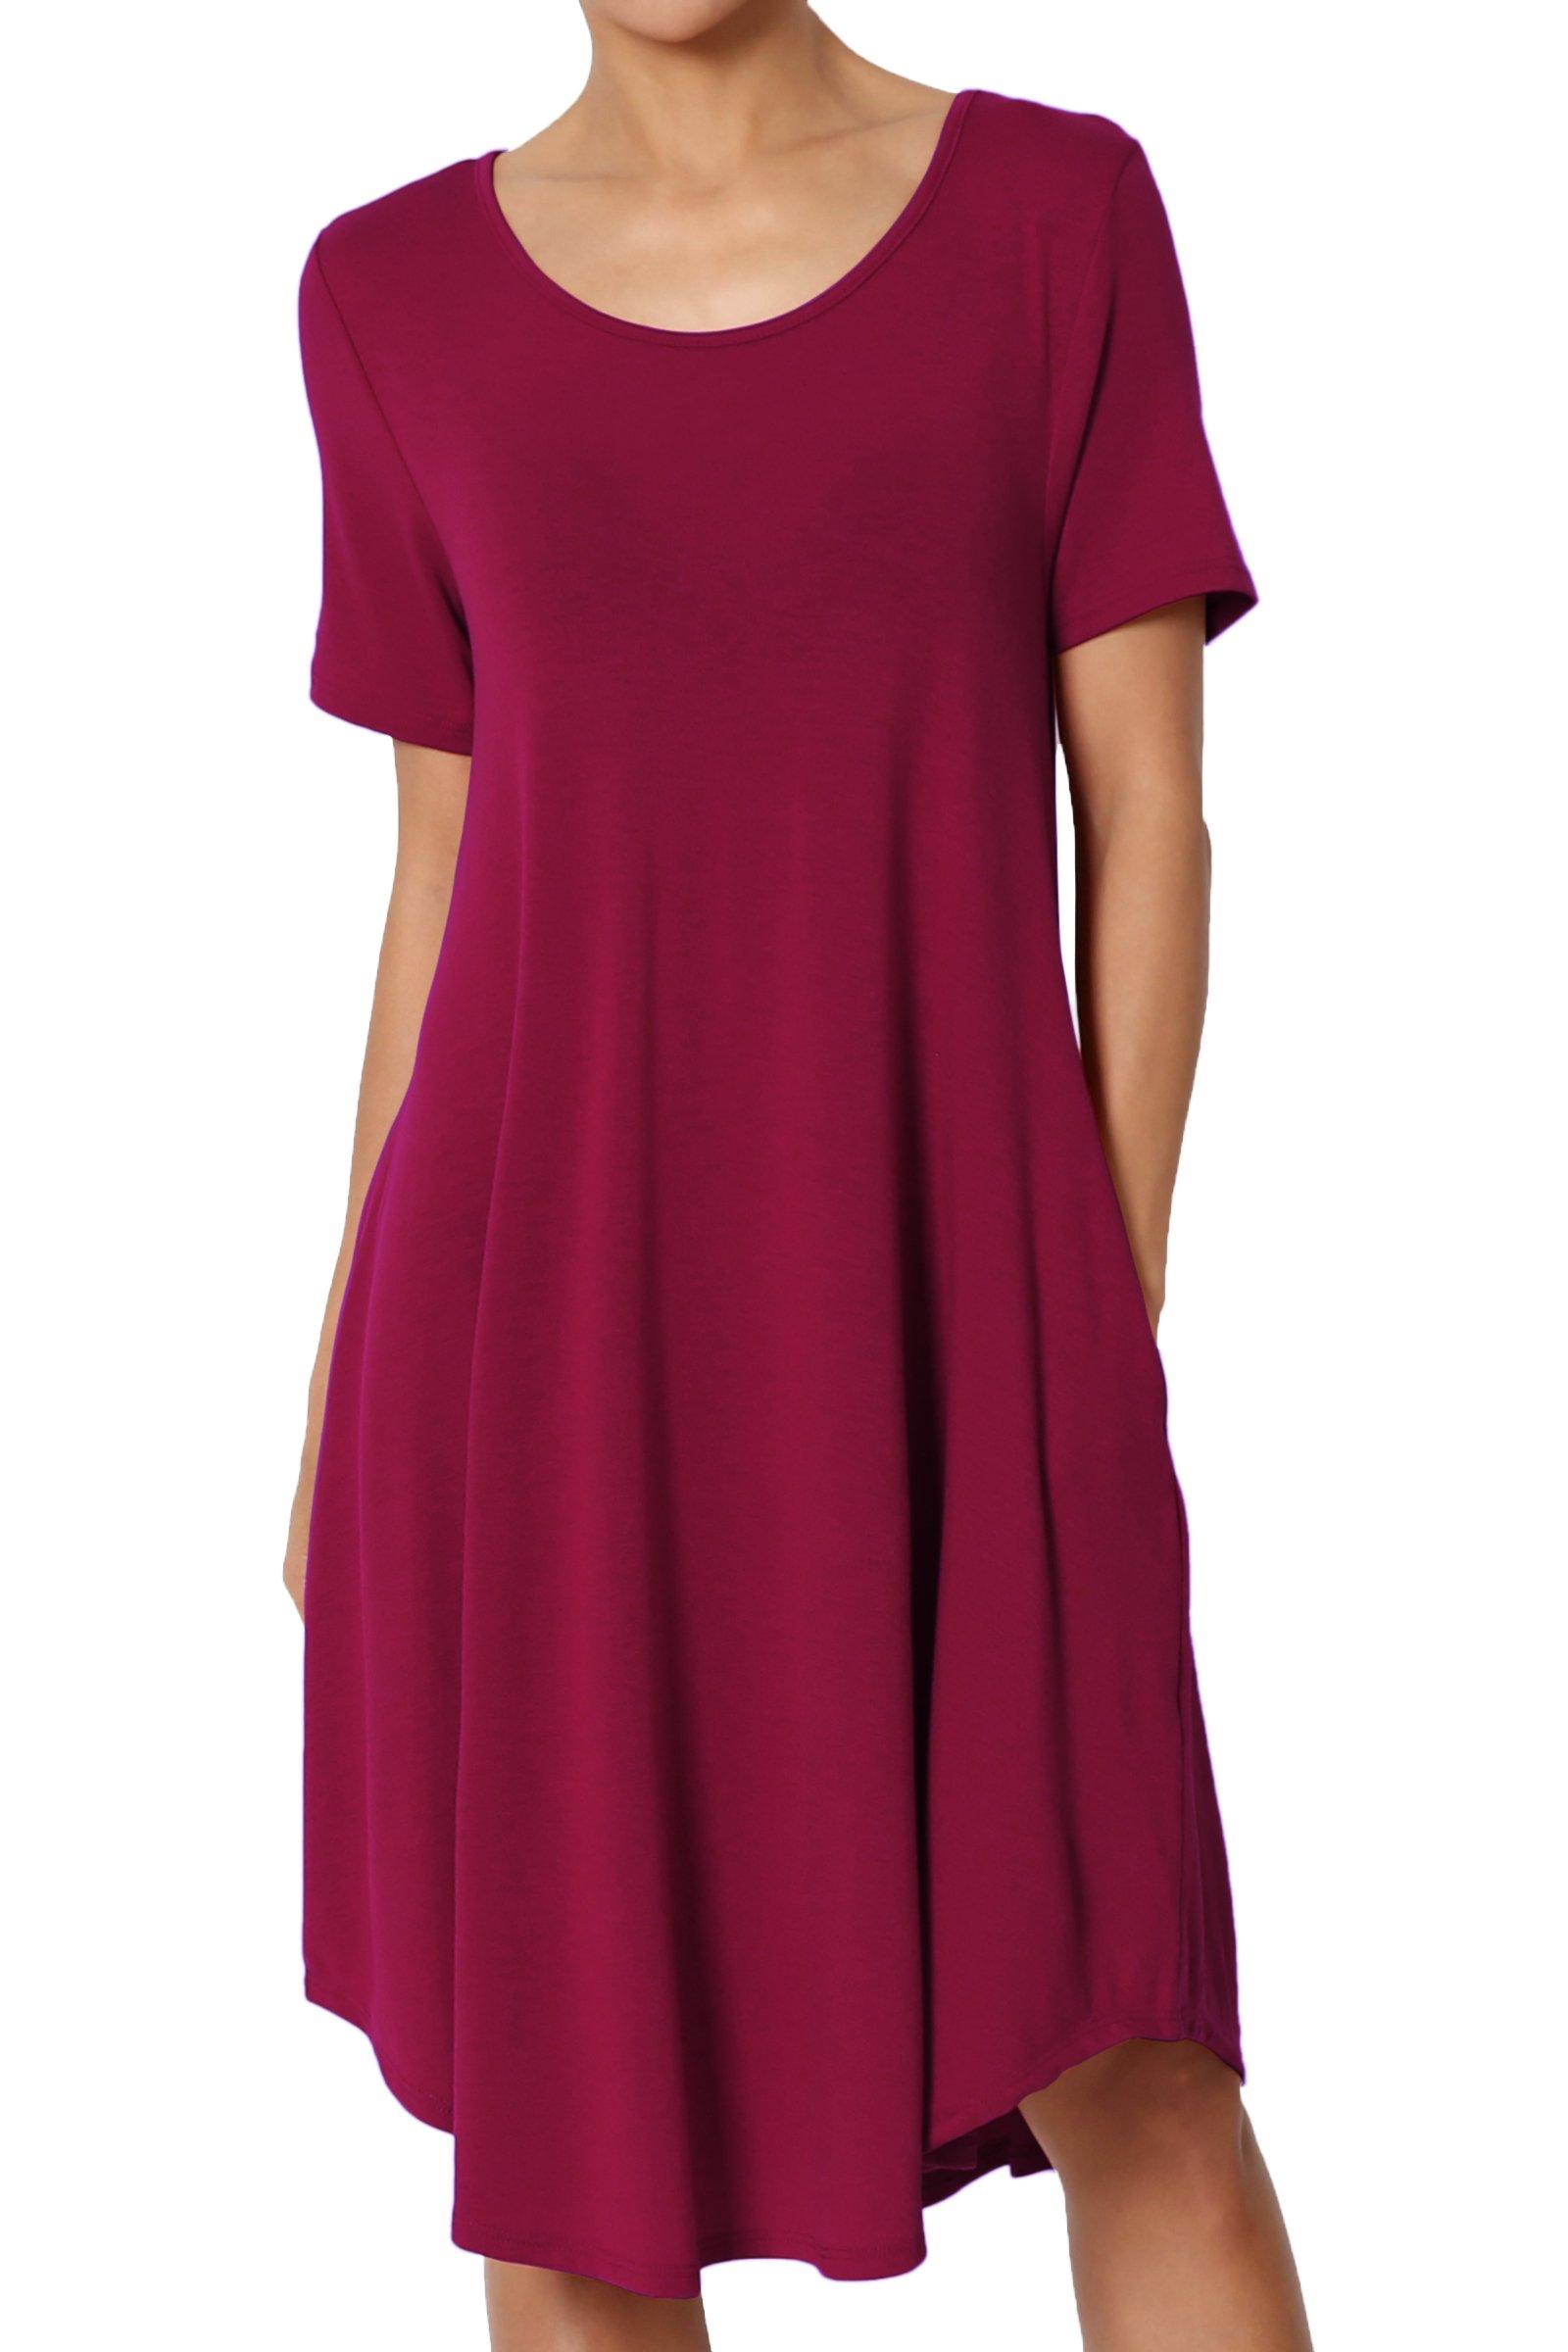 TheMogan Women's Short Sleeve Trapeze Knit Pocket T-Shirt Dress Wine 2XL